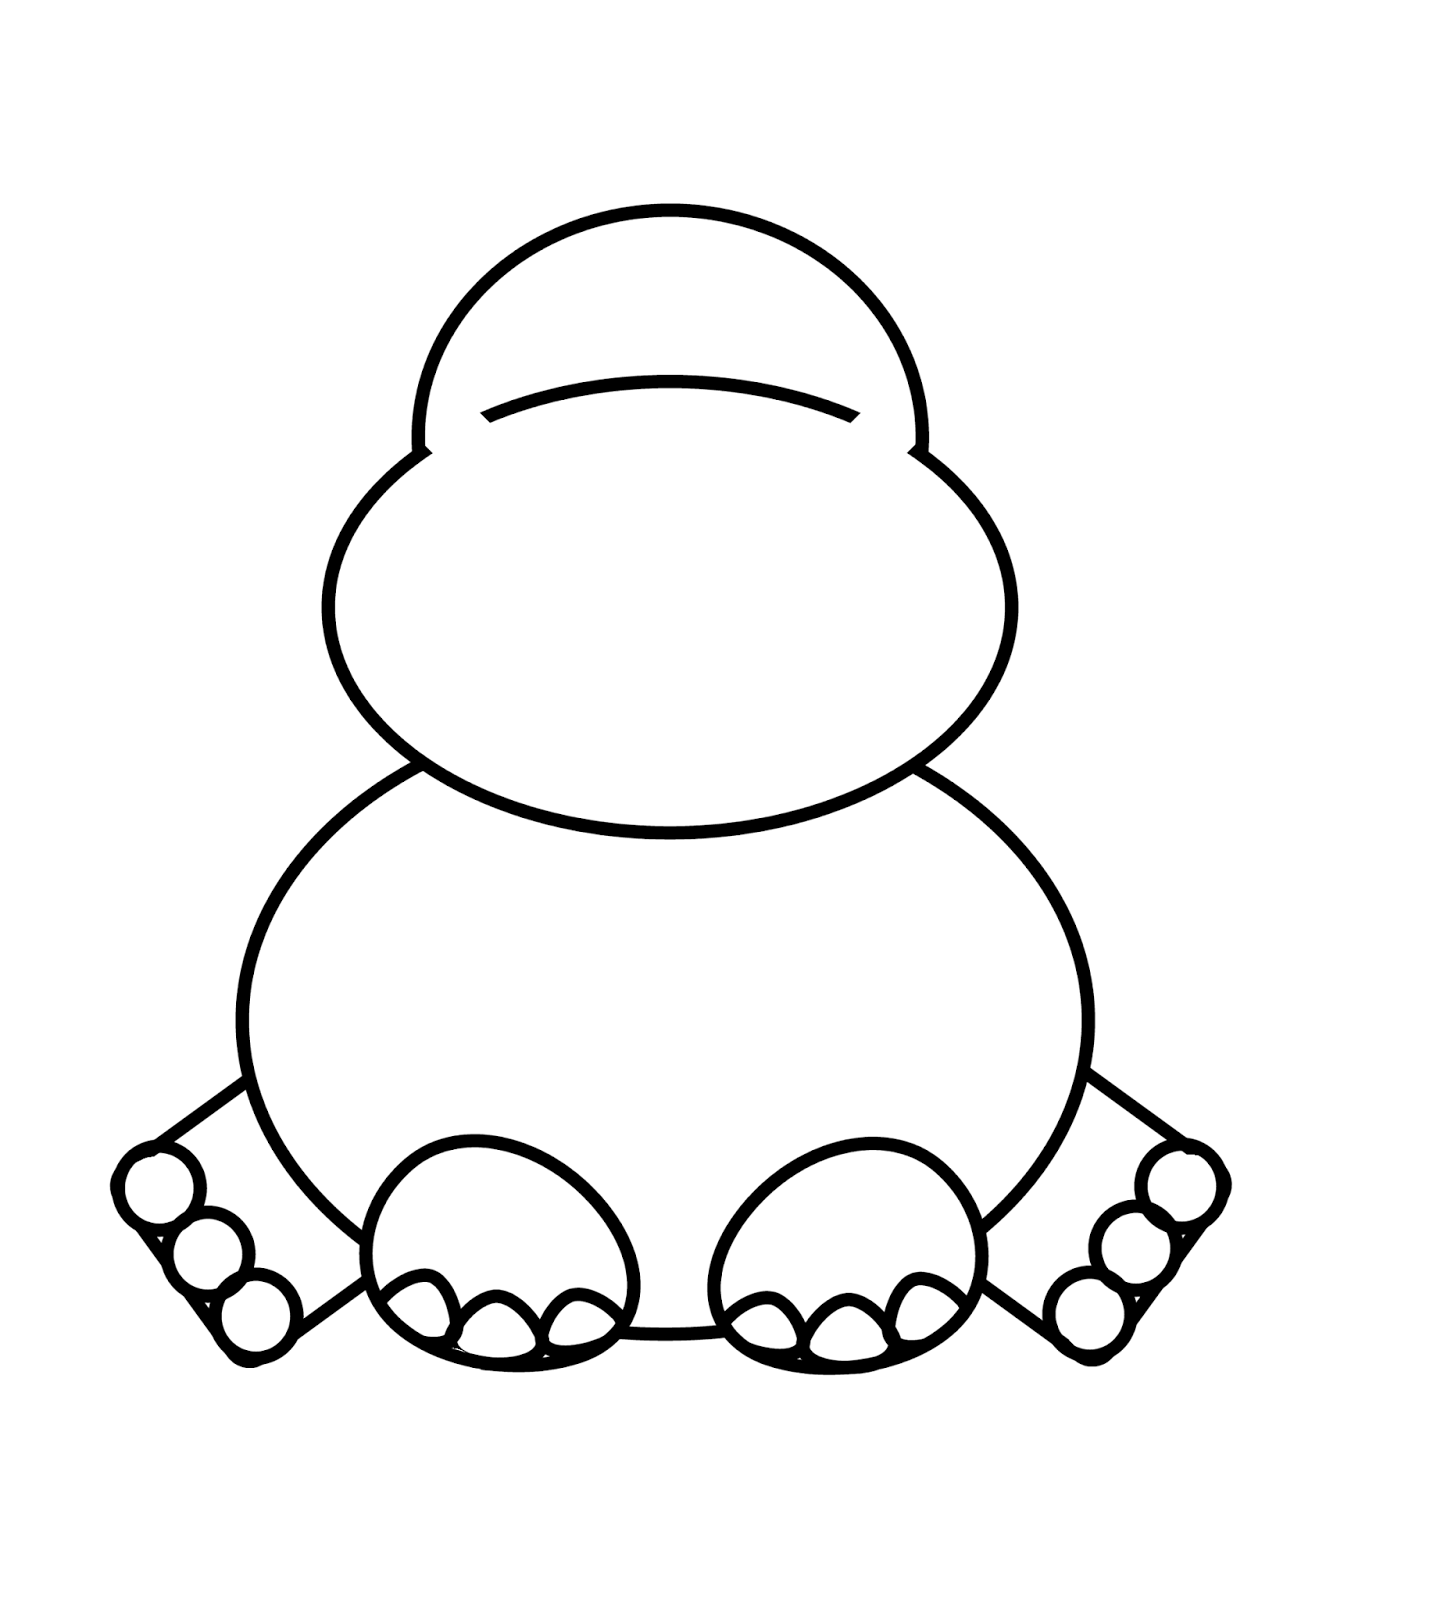 1444x1600 How To Draw Cartoons Hippo